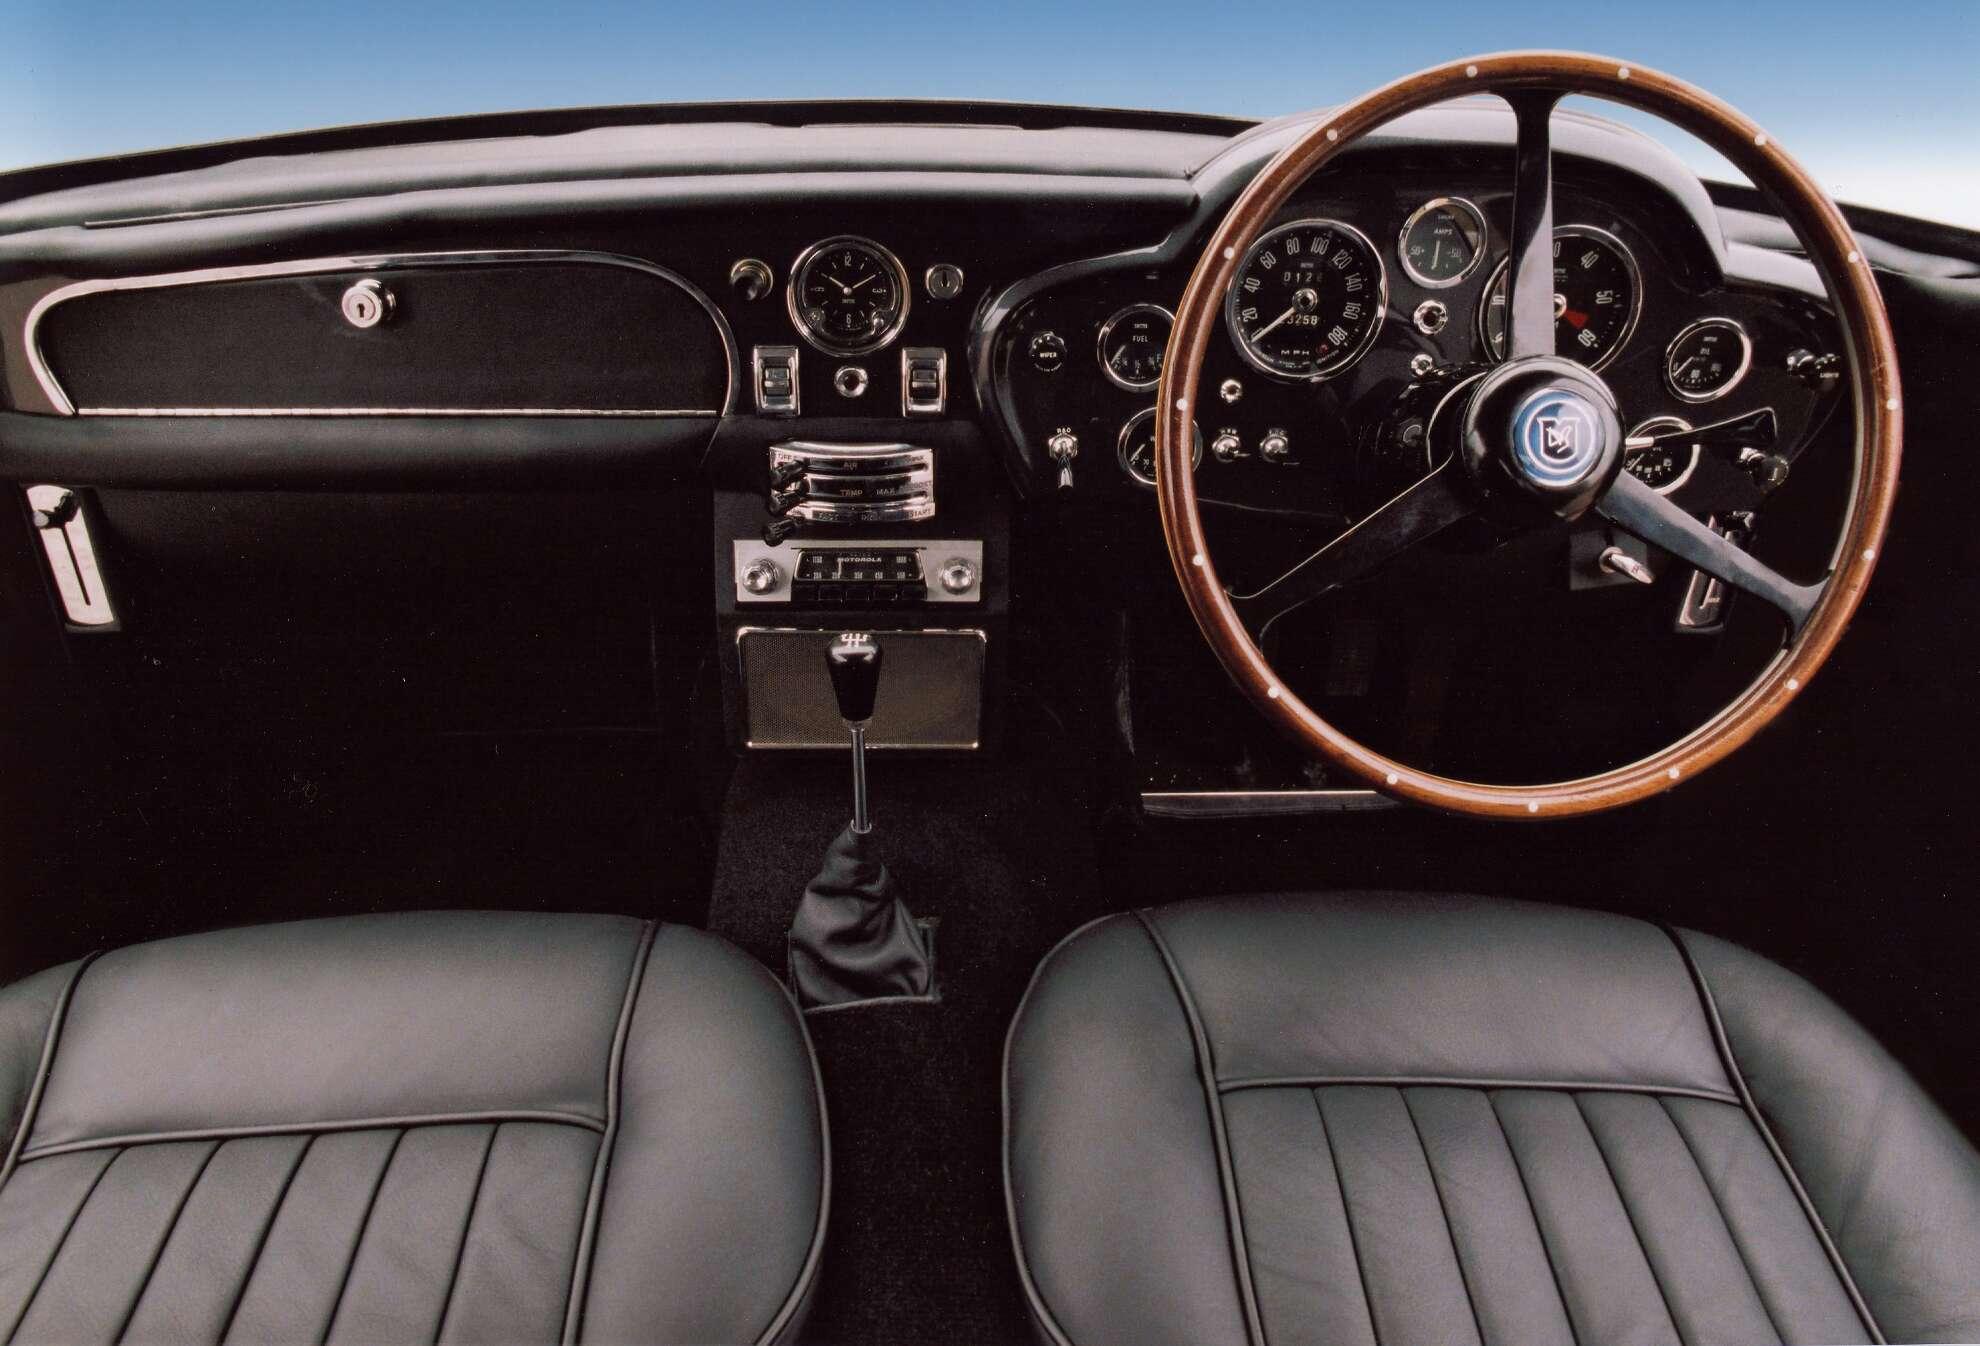 Aston Martin DB5 Interieur Cockpit